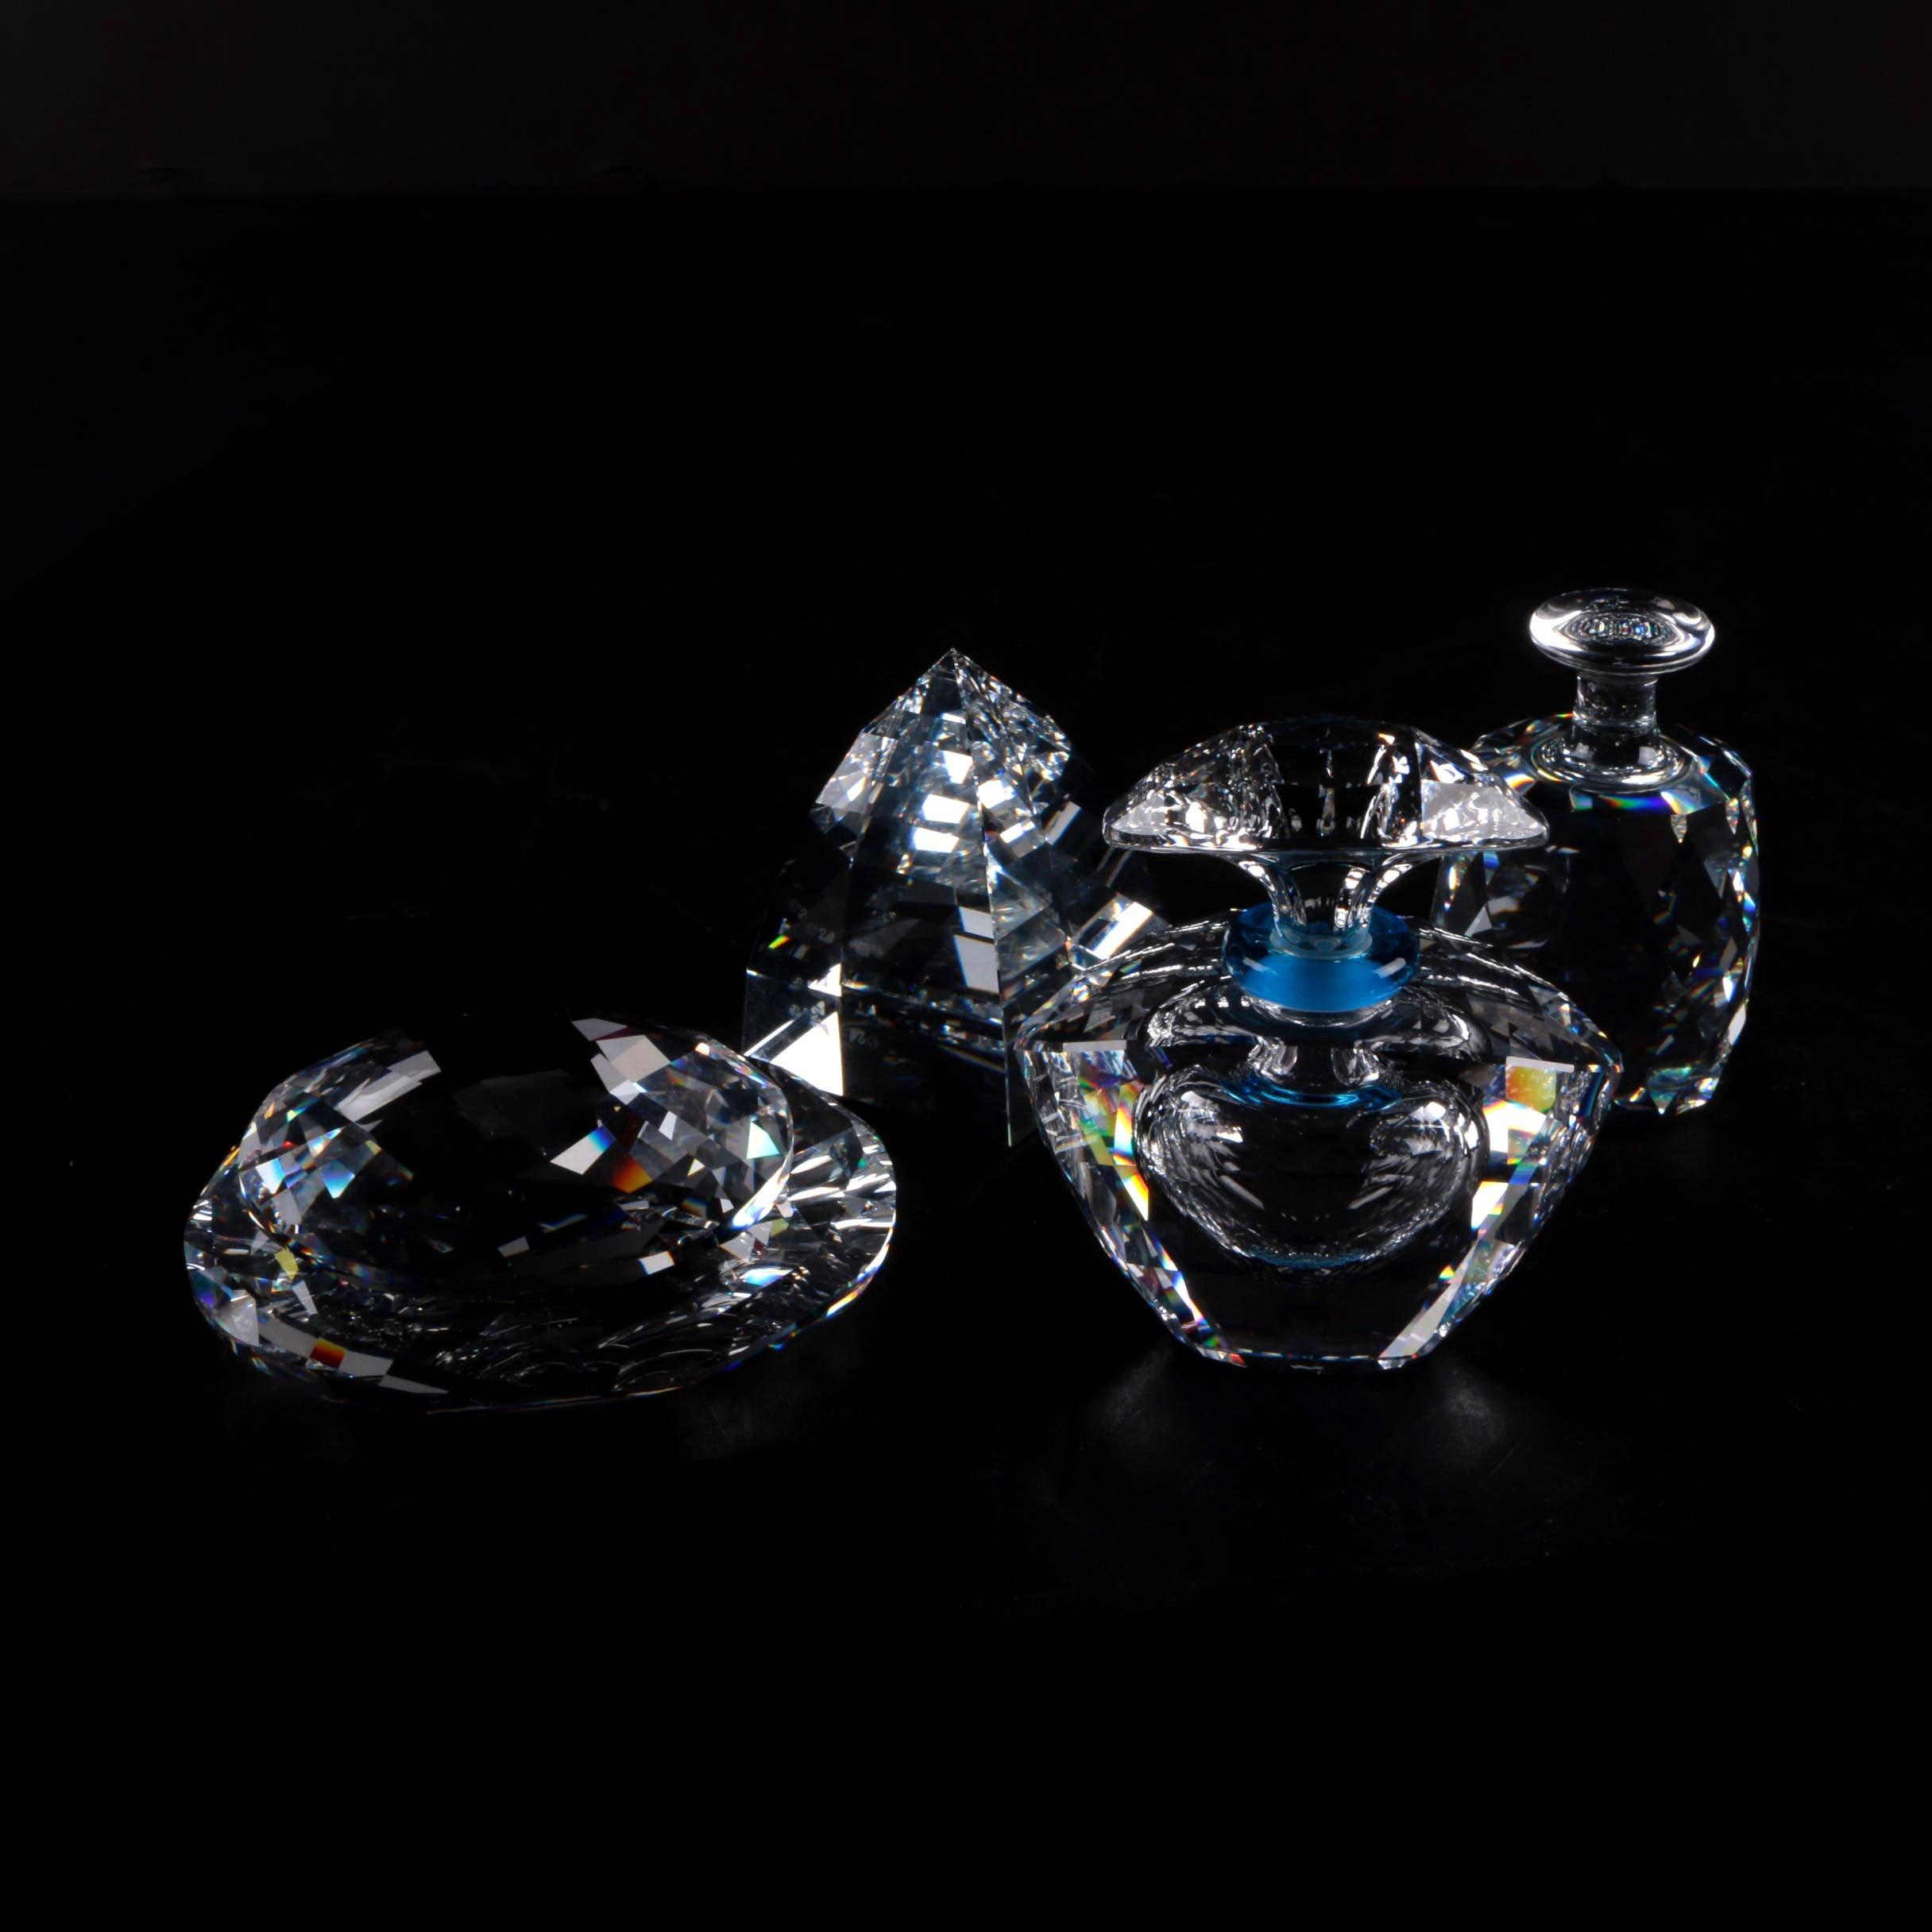 Decorative Swarovski Crystal Bottle and Figurines